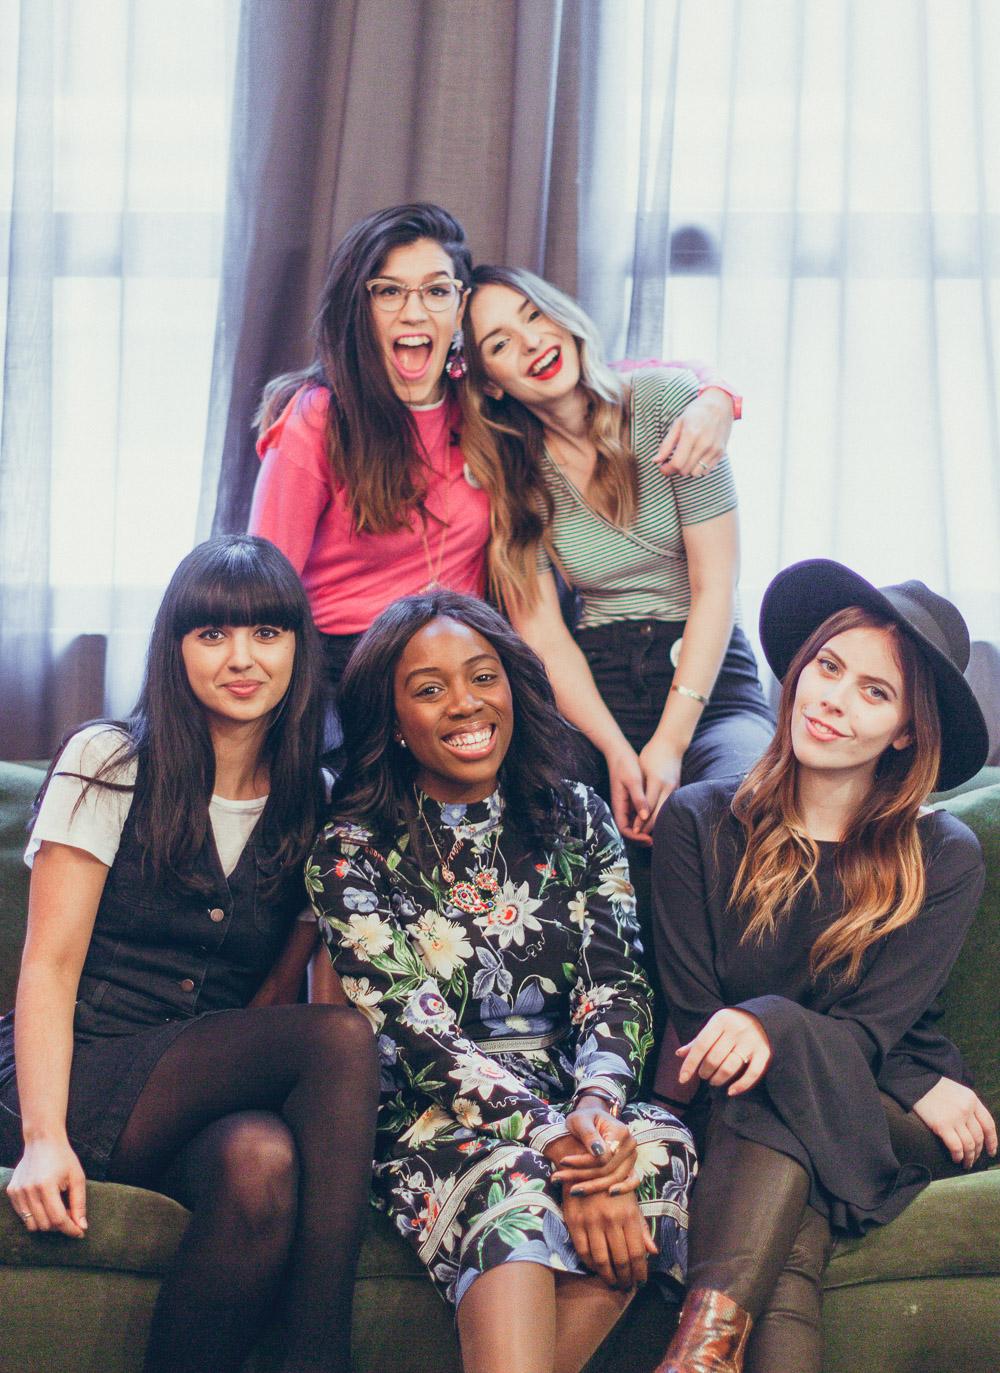 #TheBloggersMarket no.3 five blogging friends at the hoxton hotel london